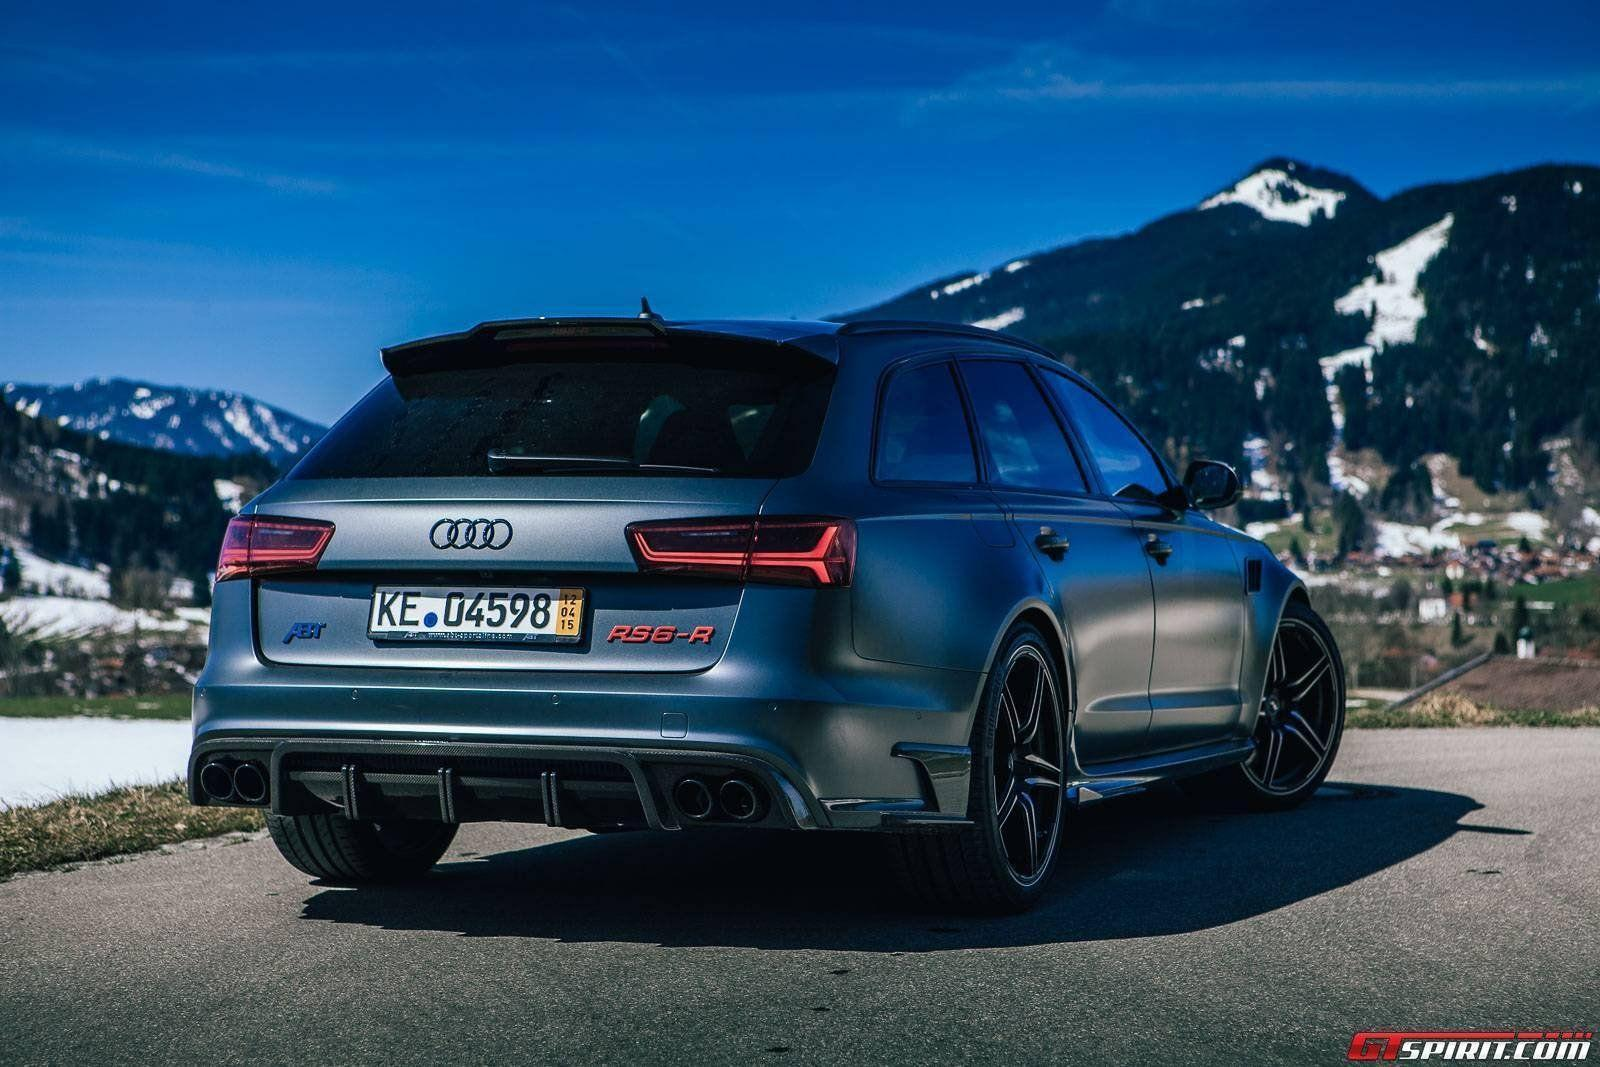 Audi rs6-r wagon mtm modified cars wallpaper | 2048x1340 | 674277 ...